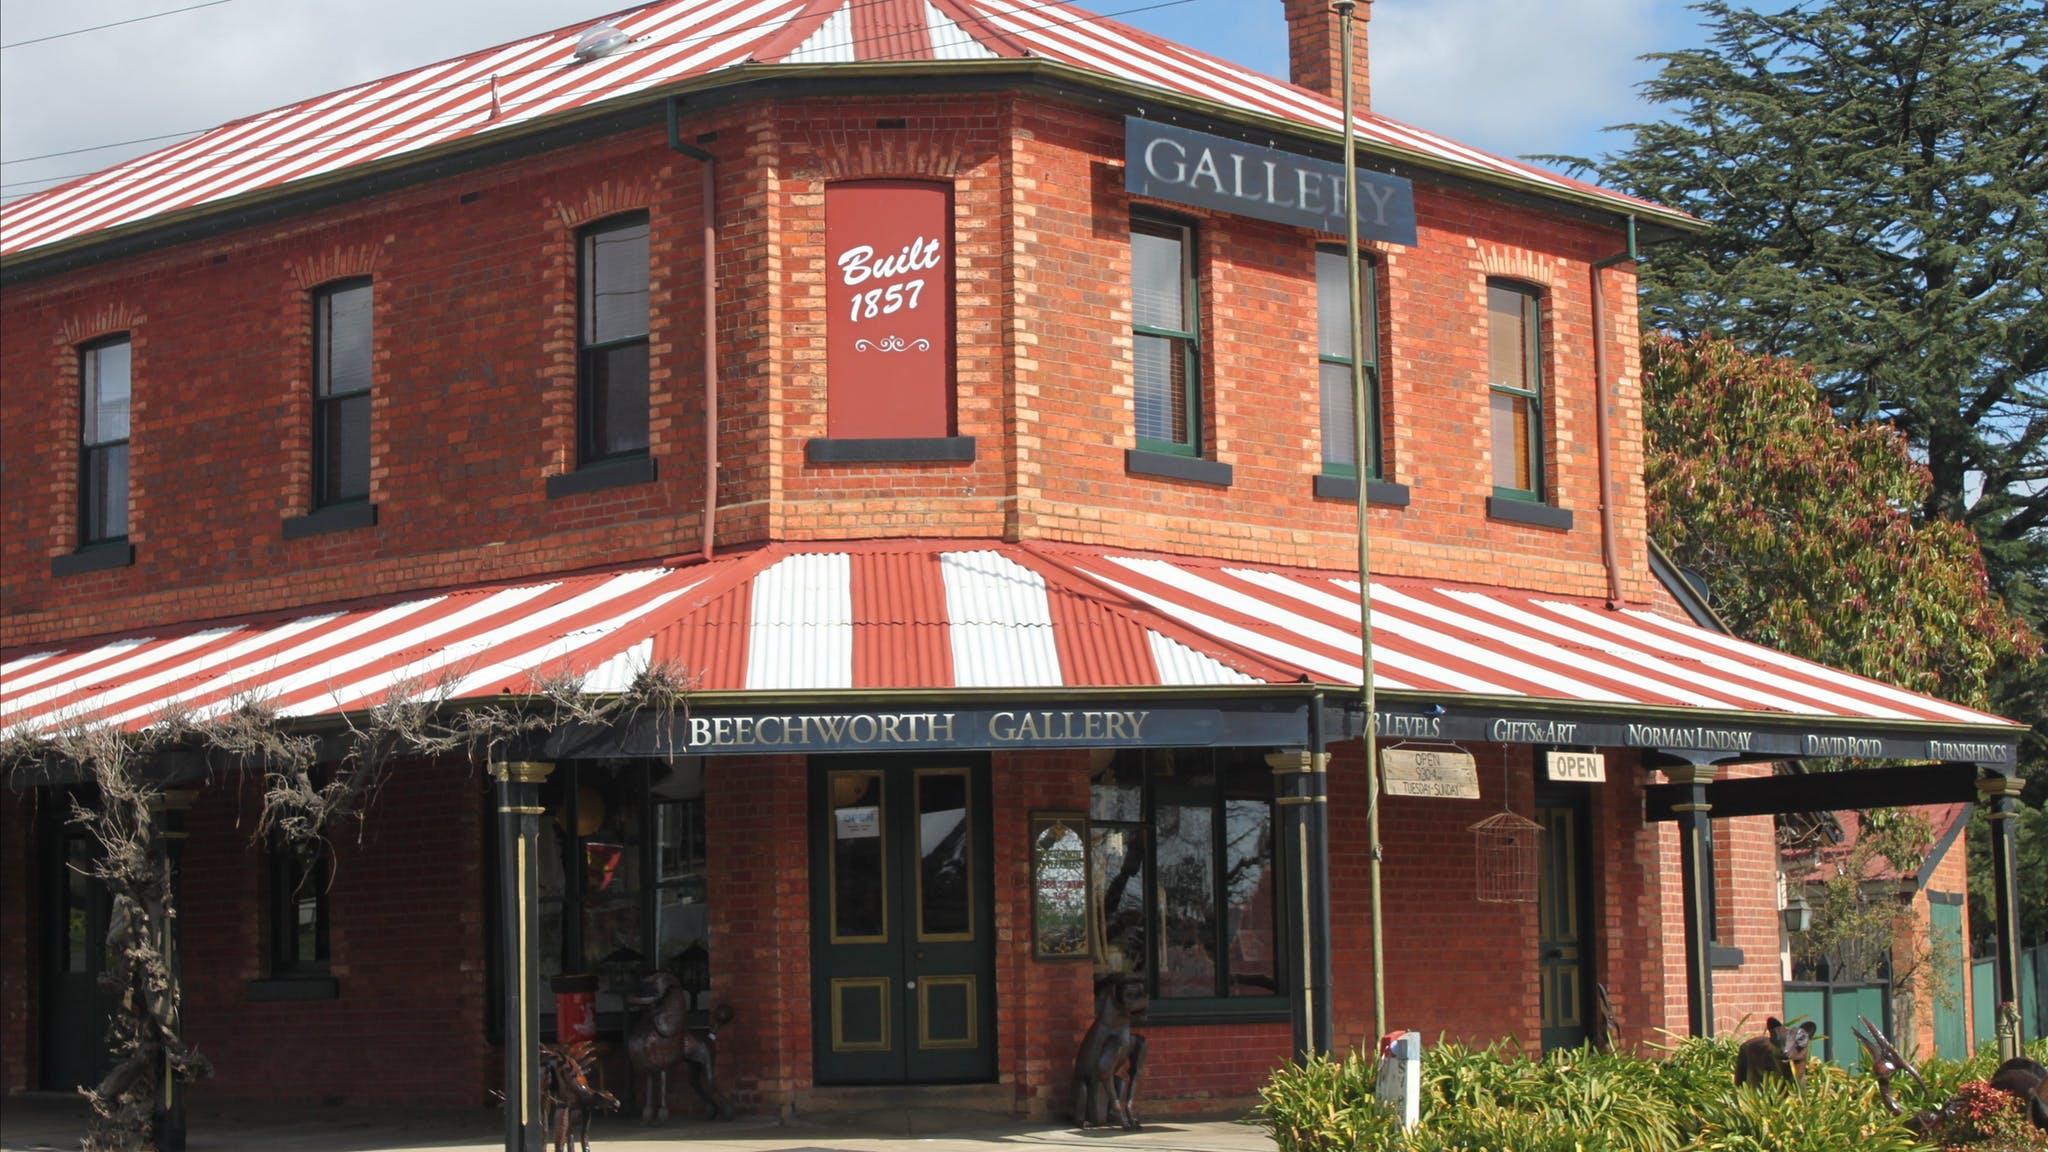 Beechworth Galleries